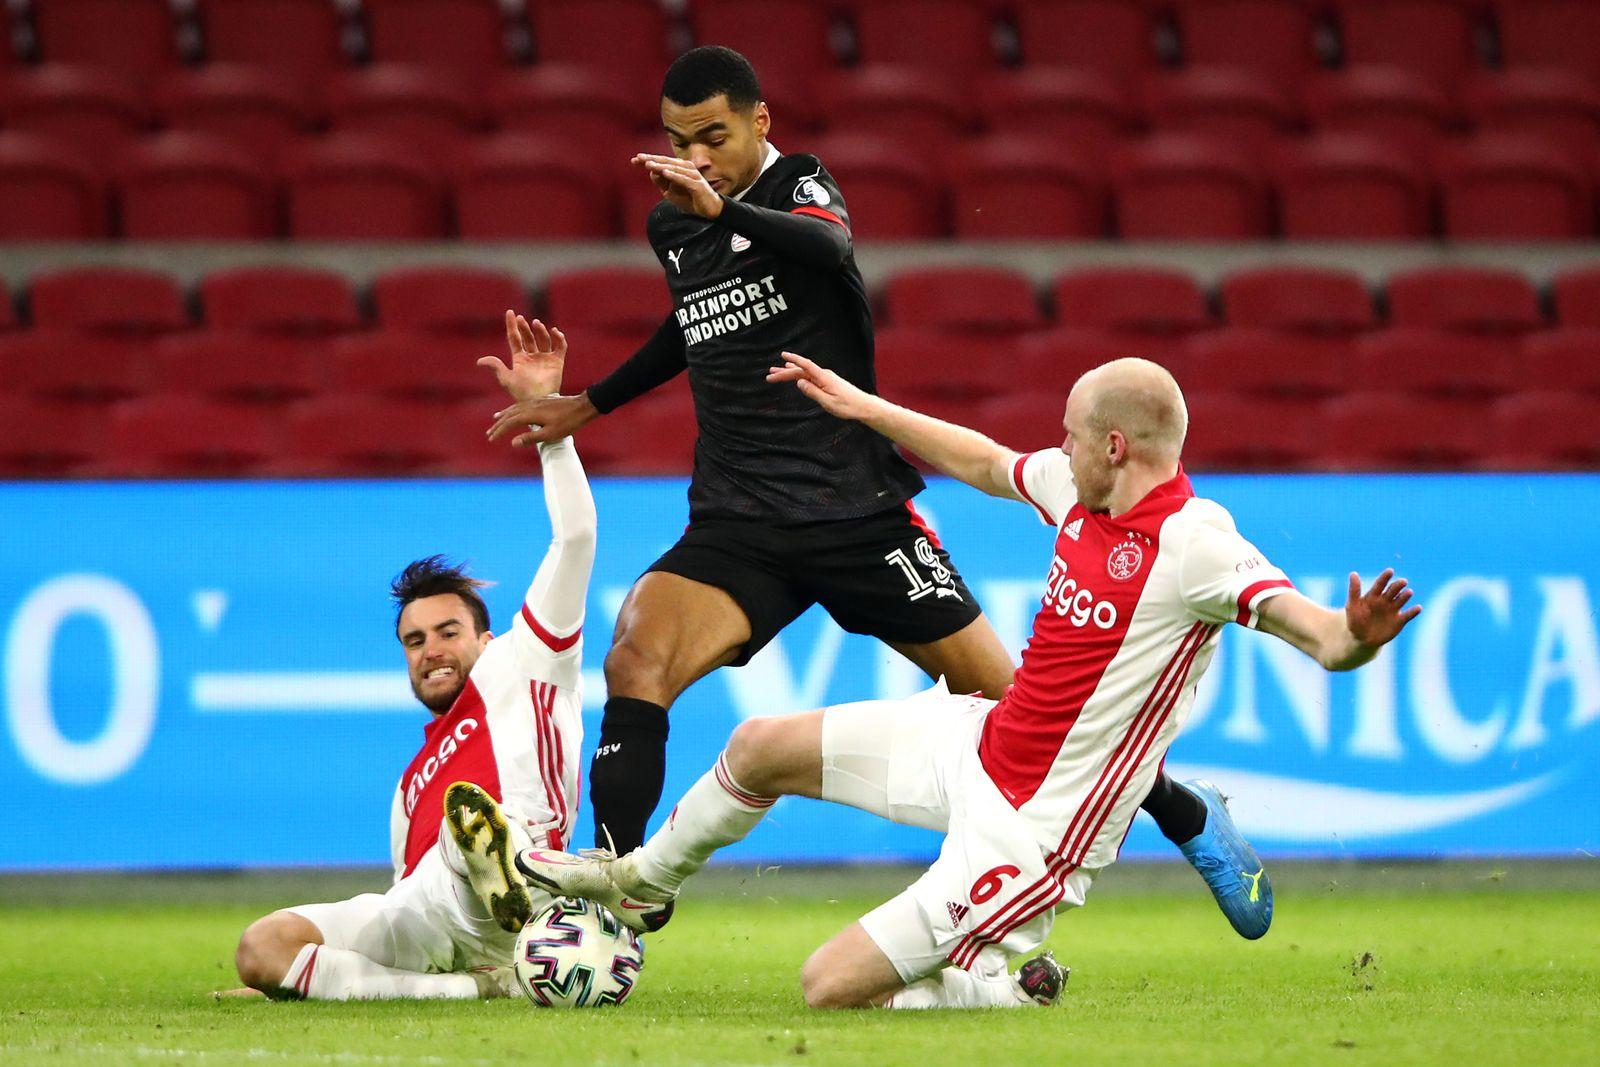 Ajax v PSV Eindhoven - Dutch Eredivisie